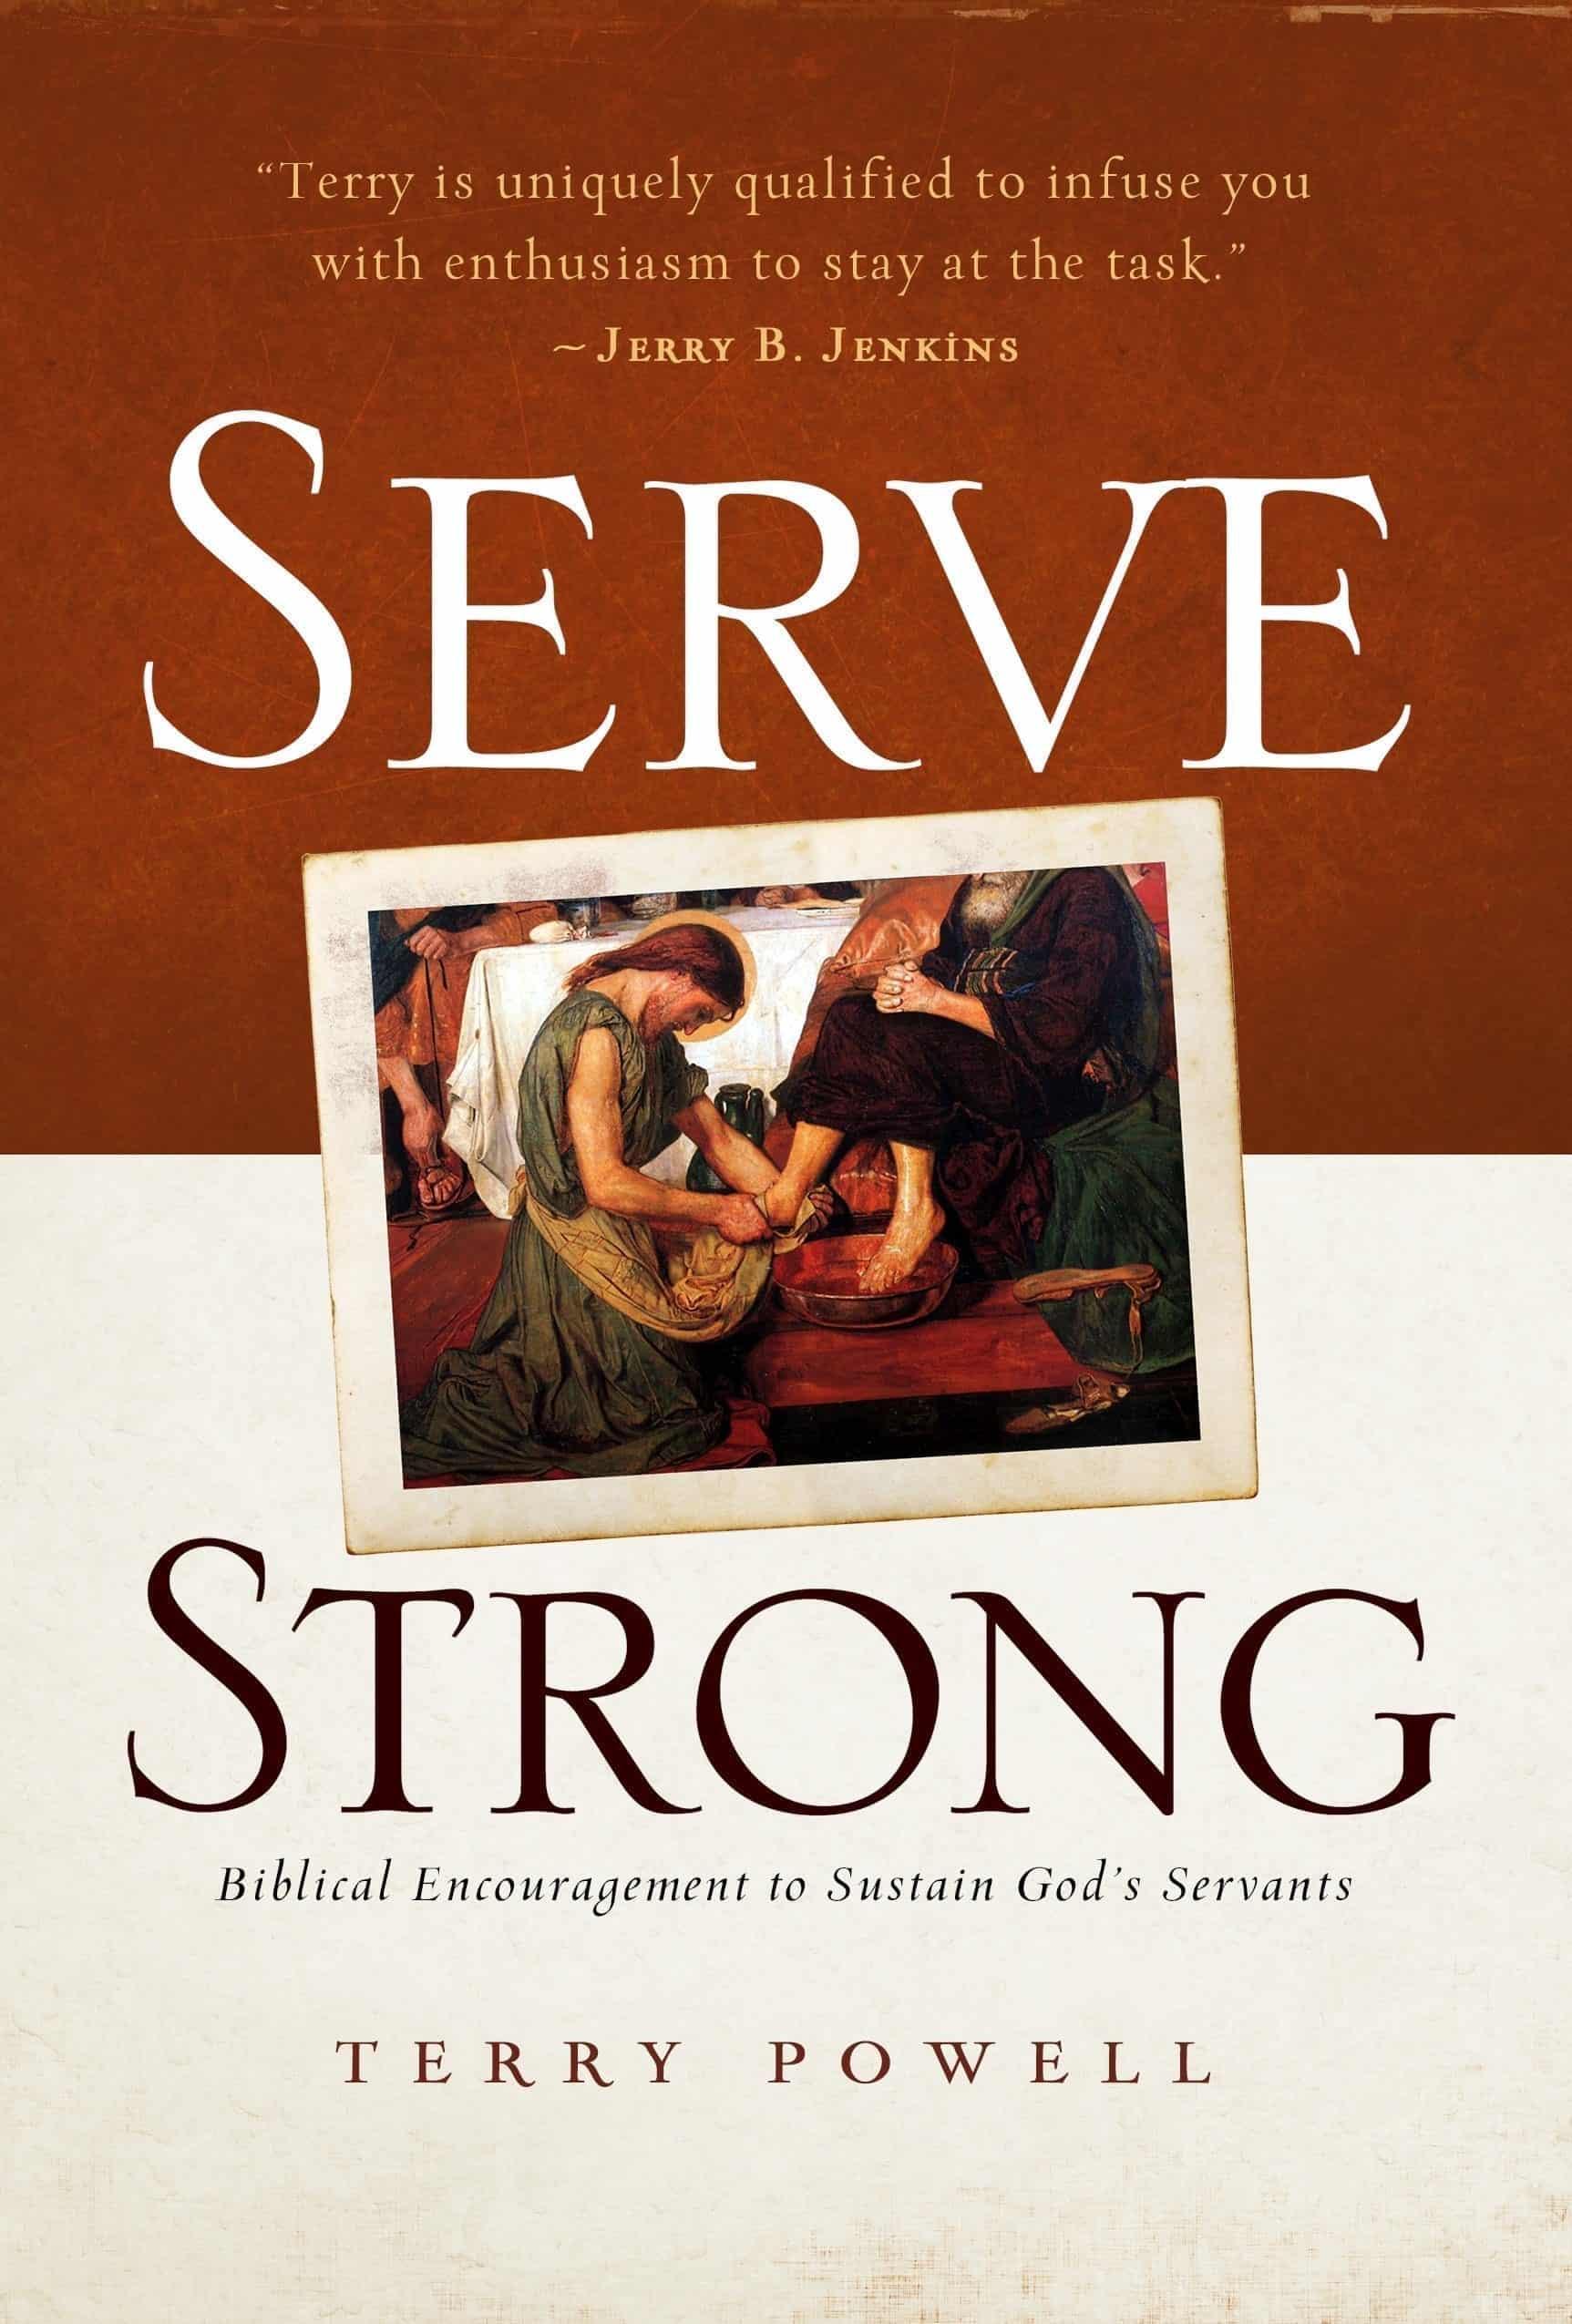 Serve Strong: Biblical Encouragement to Sustain God's Servants